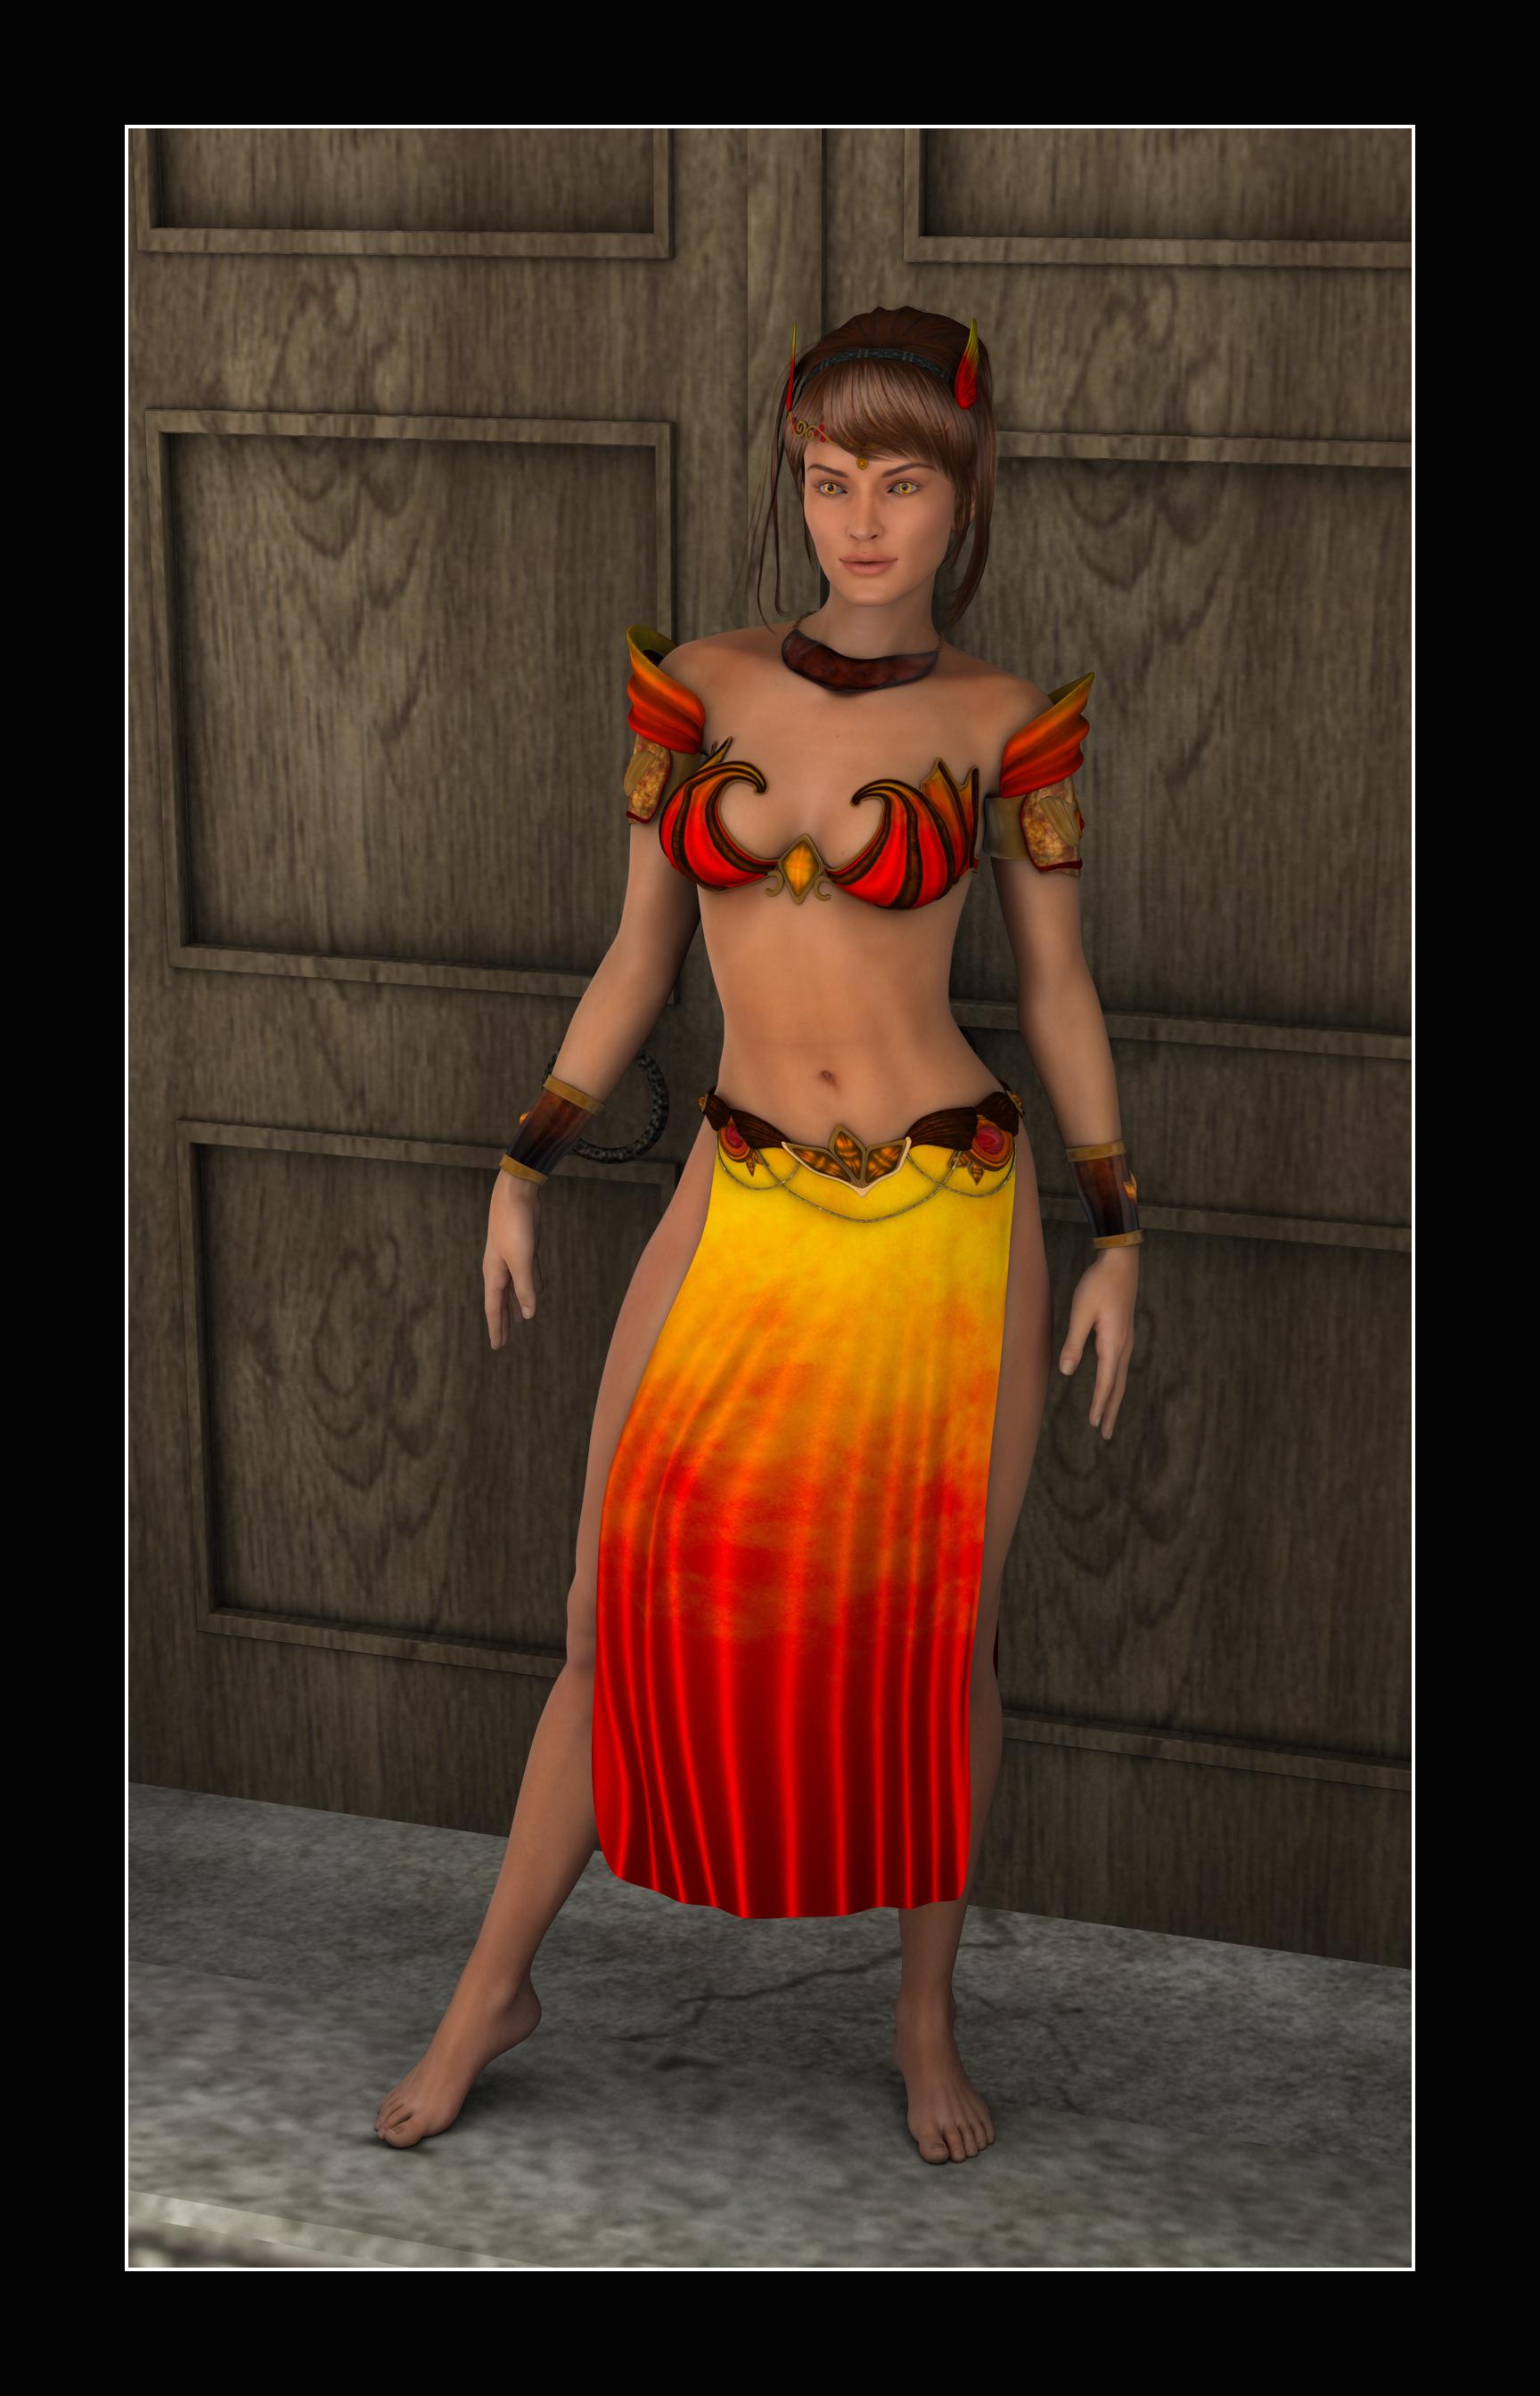 http://orig07.deviantart.net/f13f/f/2015/177/6/a/hannah_in_iona_outfit_by_citizenolek-d8yw06z.jpg